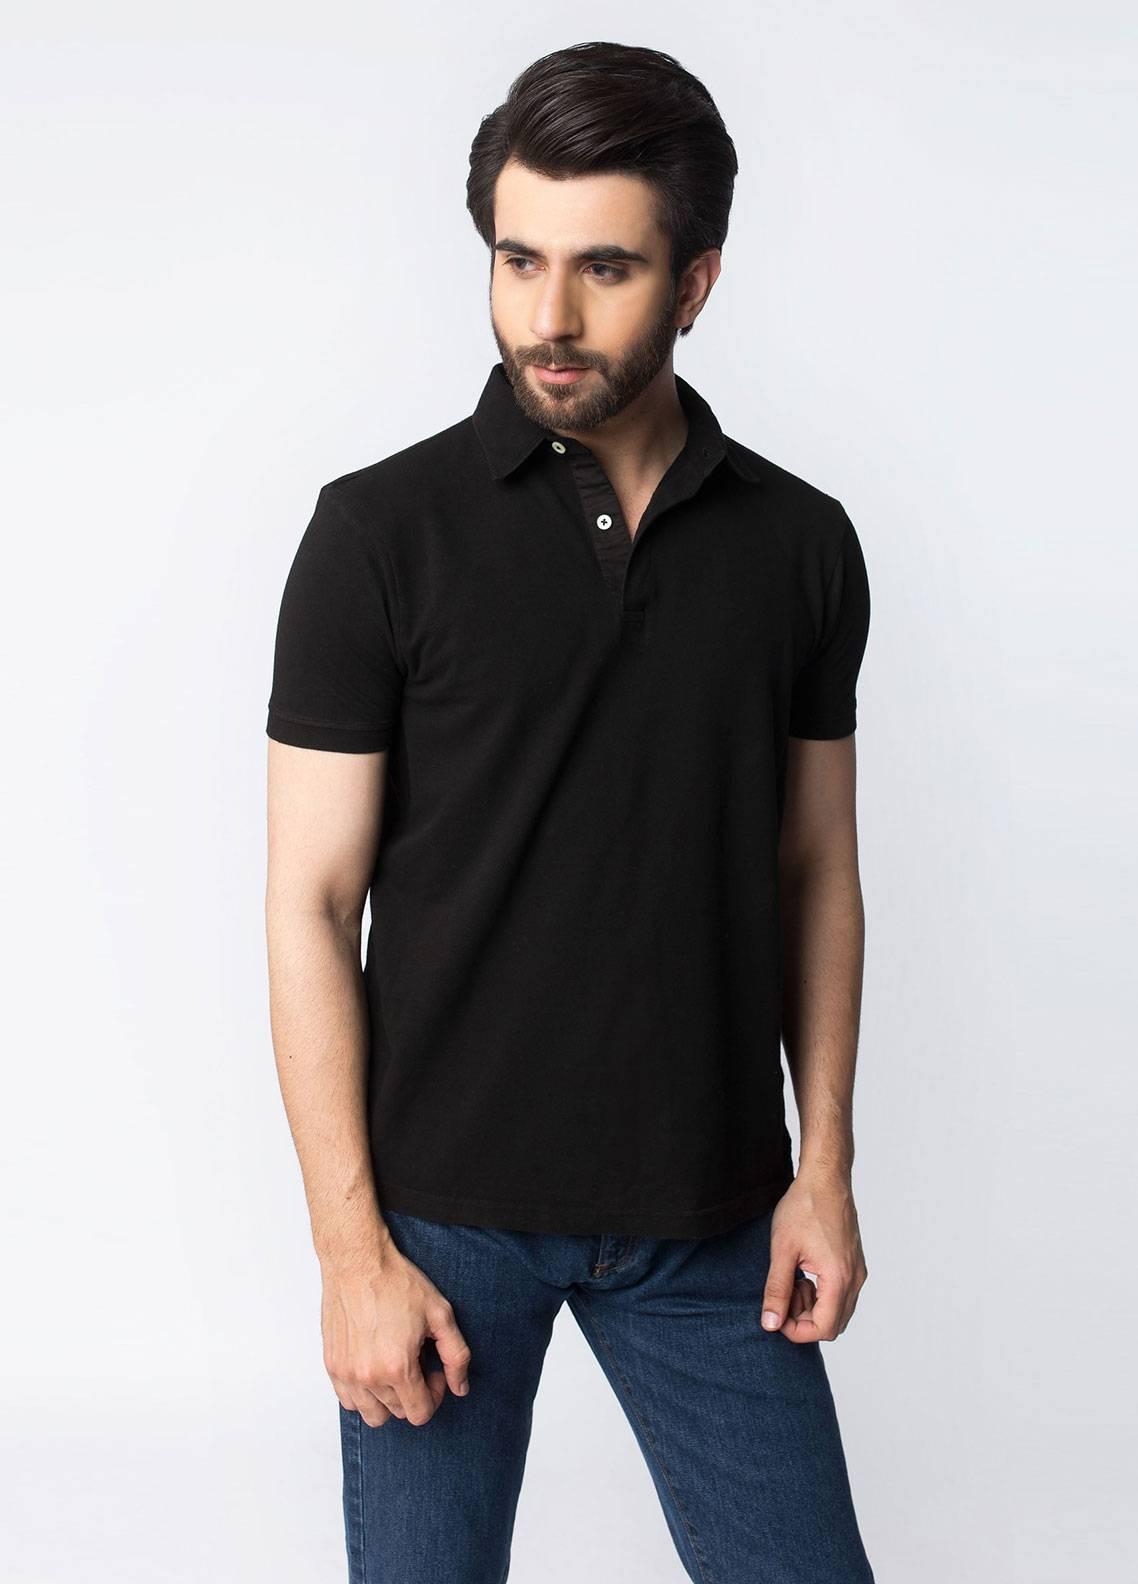 Brumano Cotton Polo Shirts for Men - Black BRM-41-406-Black